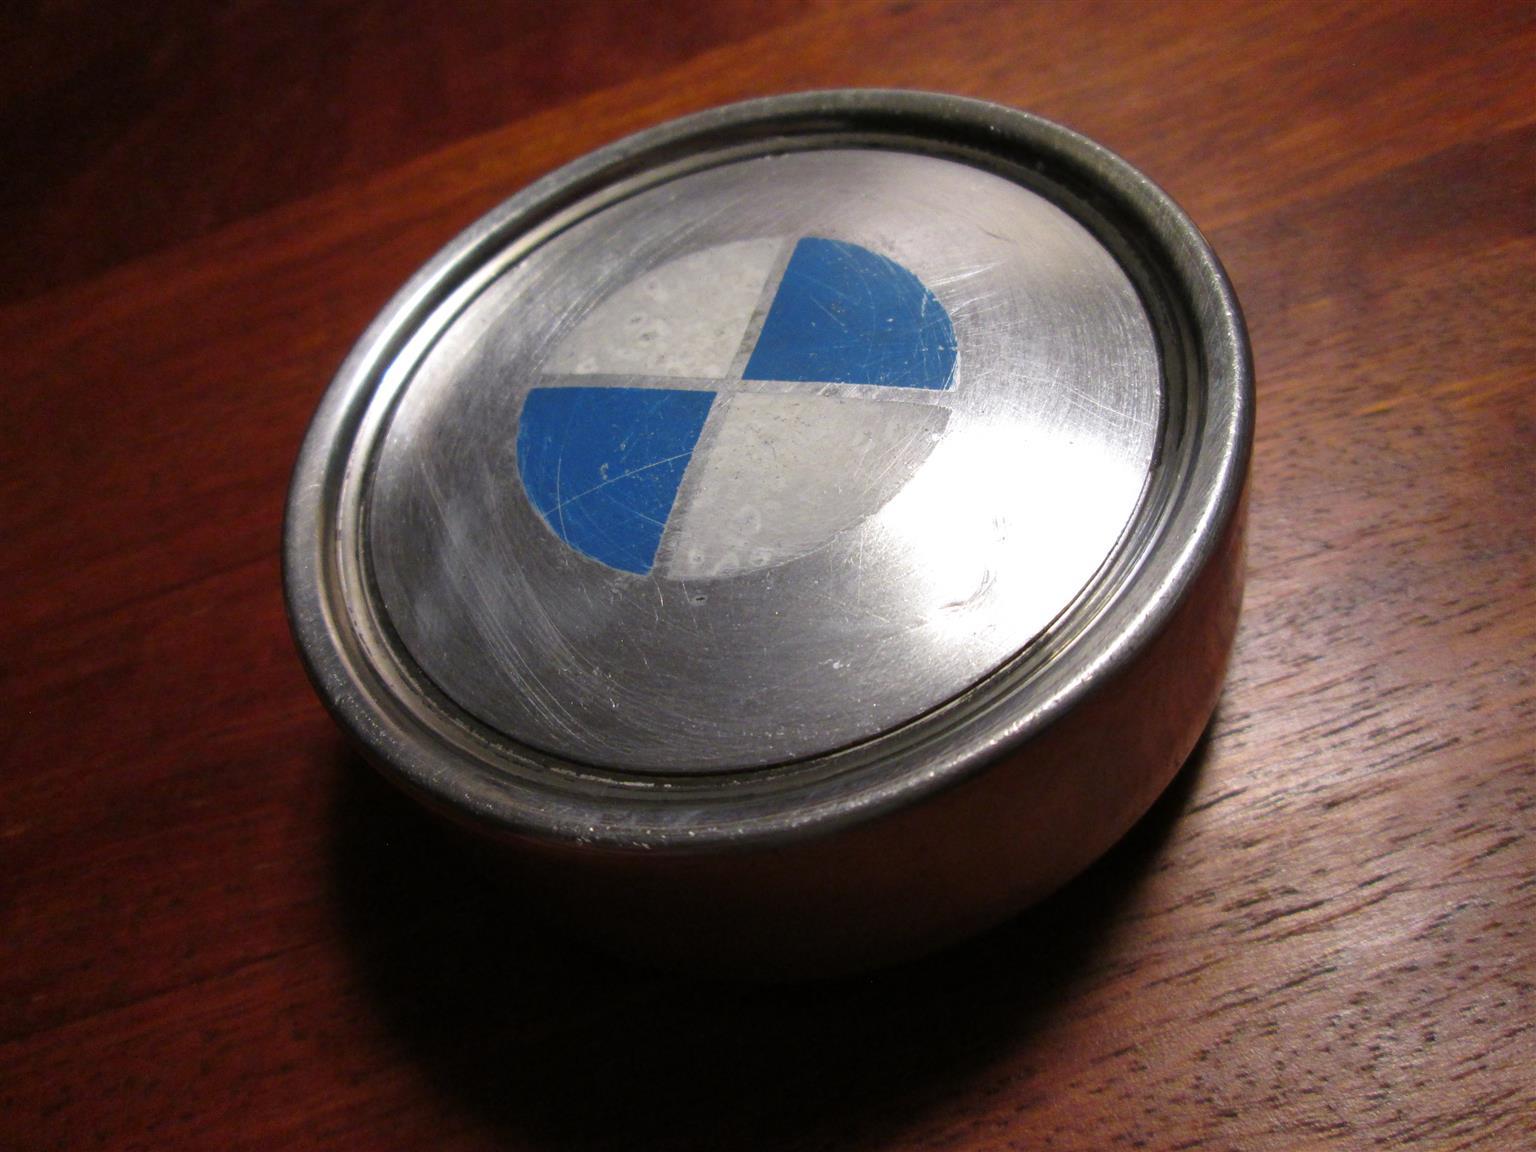 1x BMW metal wheel cap, centre cap, older/classic models, 75-80 mm diameter, used